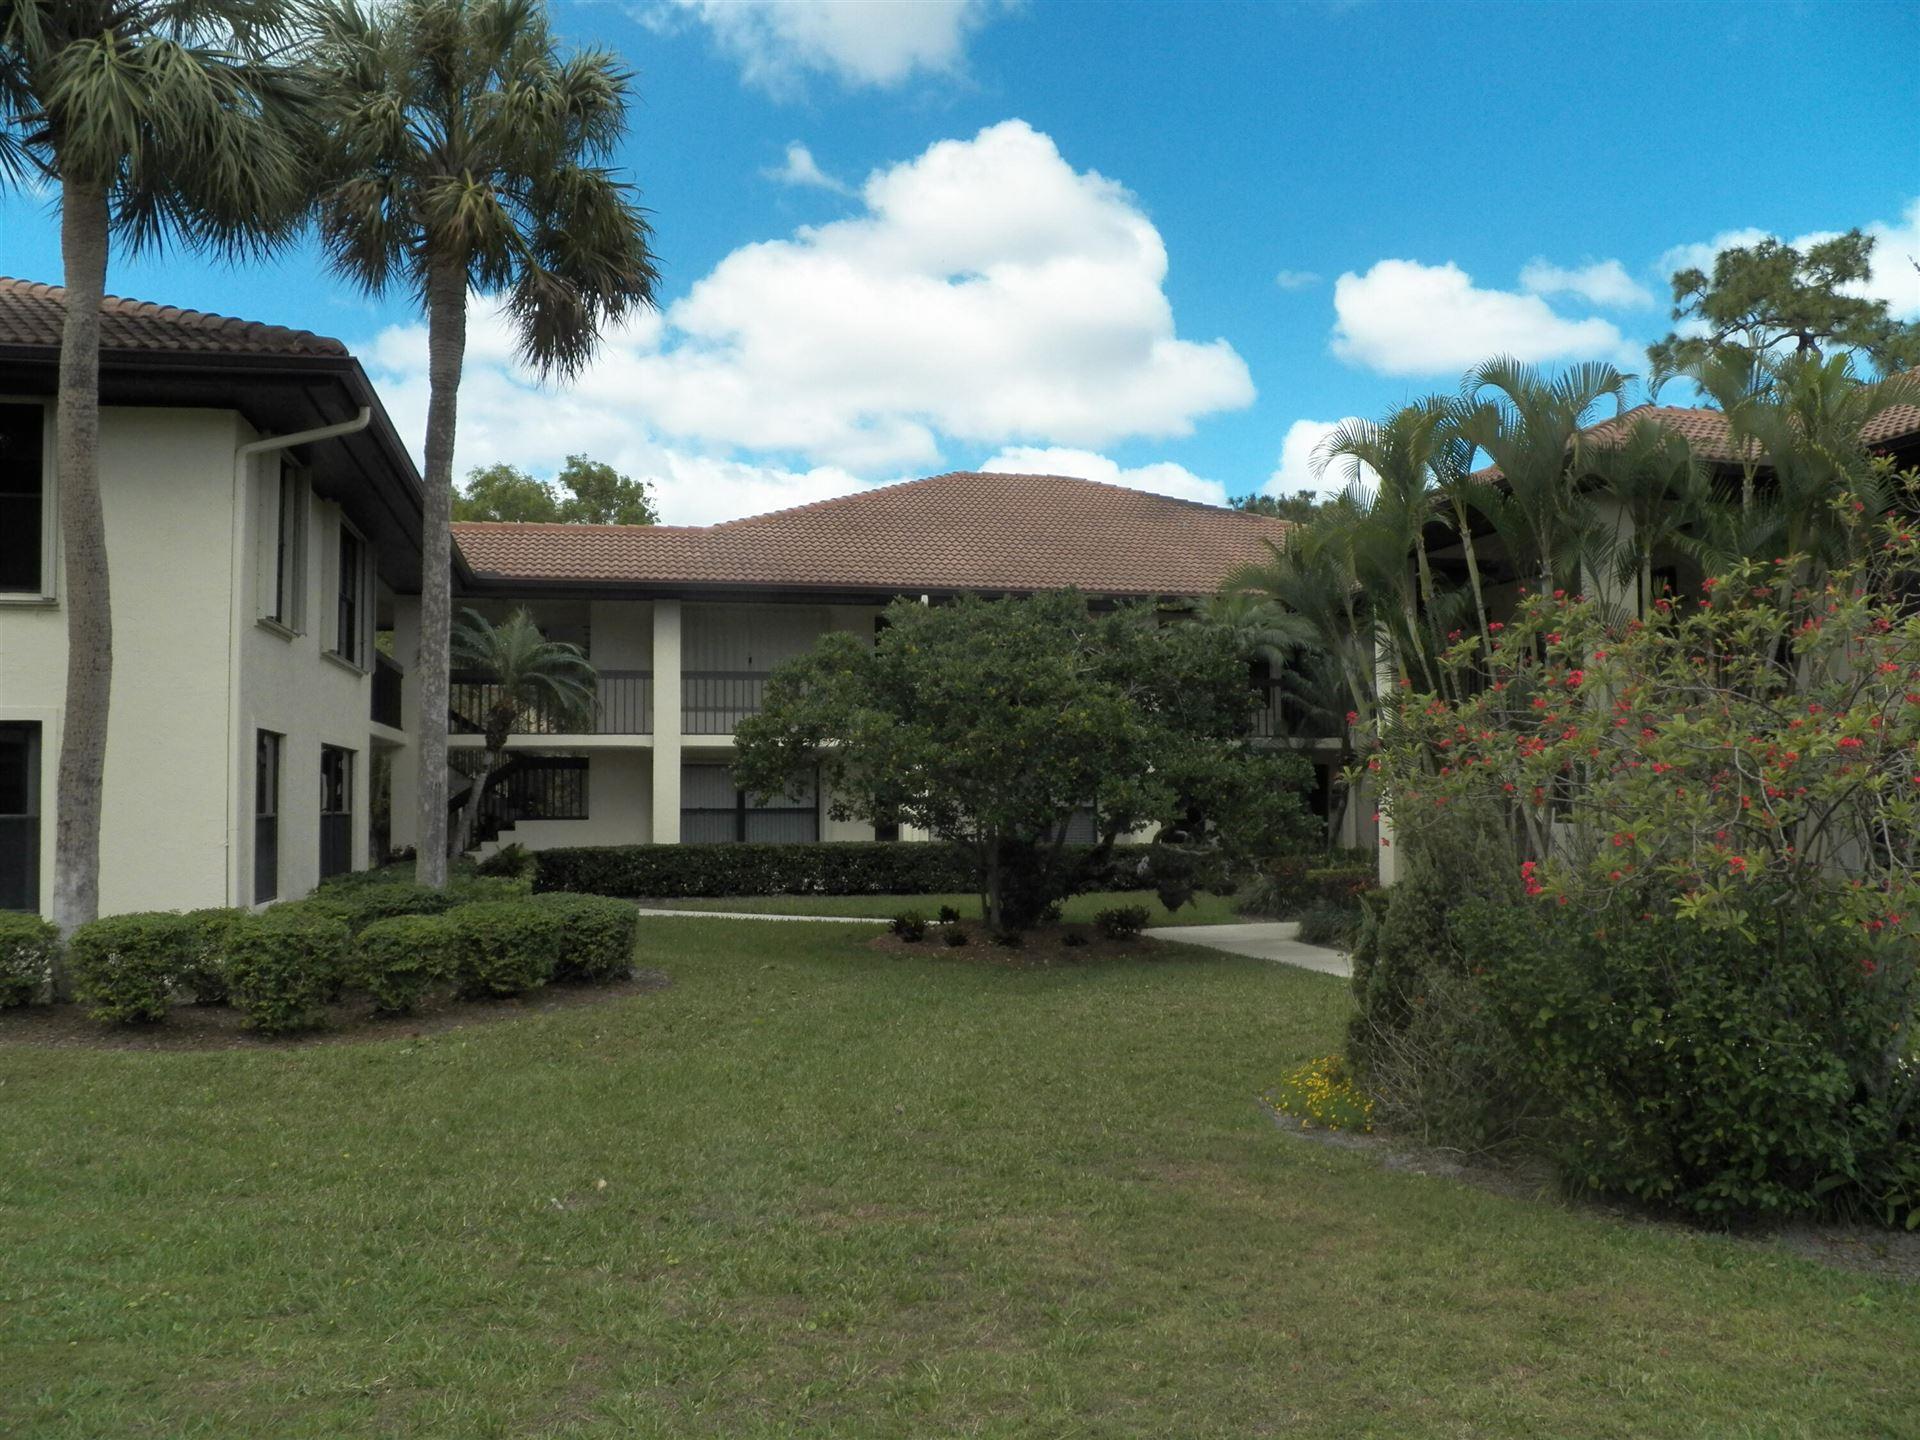 211 SW South River Drive #204, Stuart, FL 34997 - #: RX-10701664